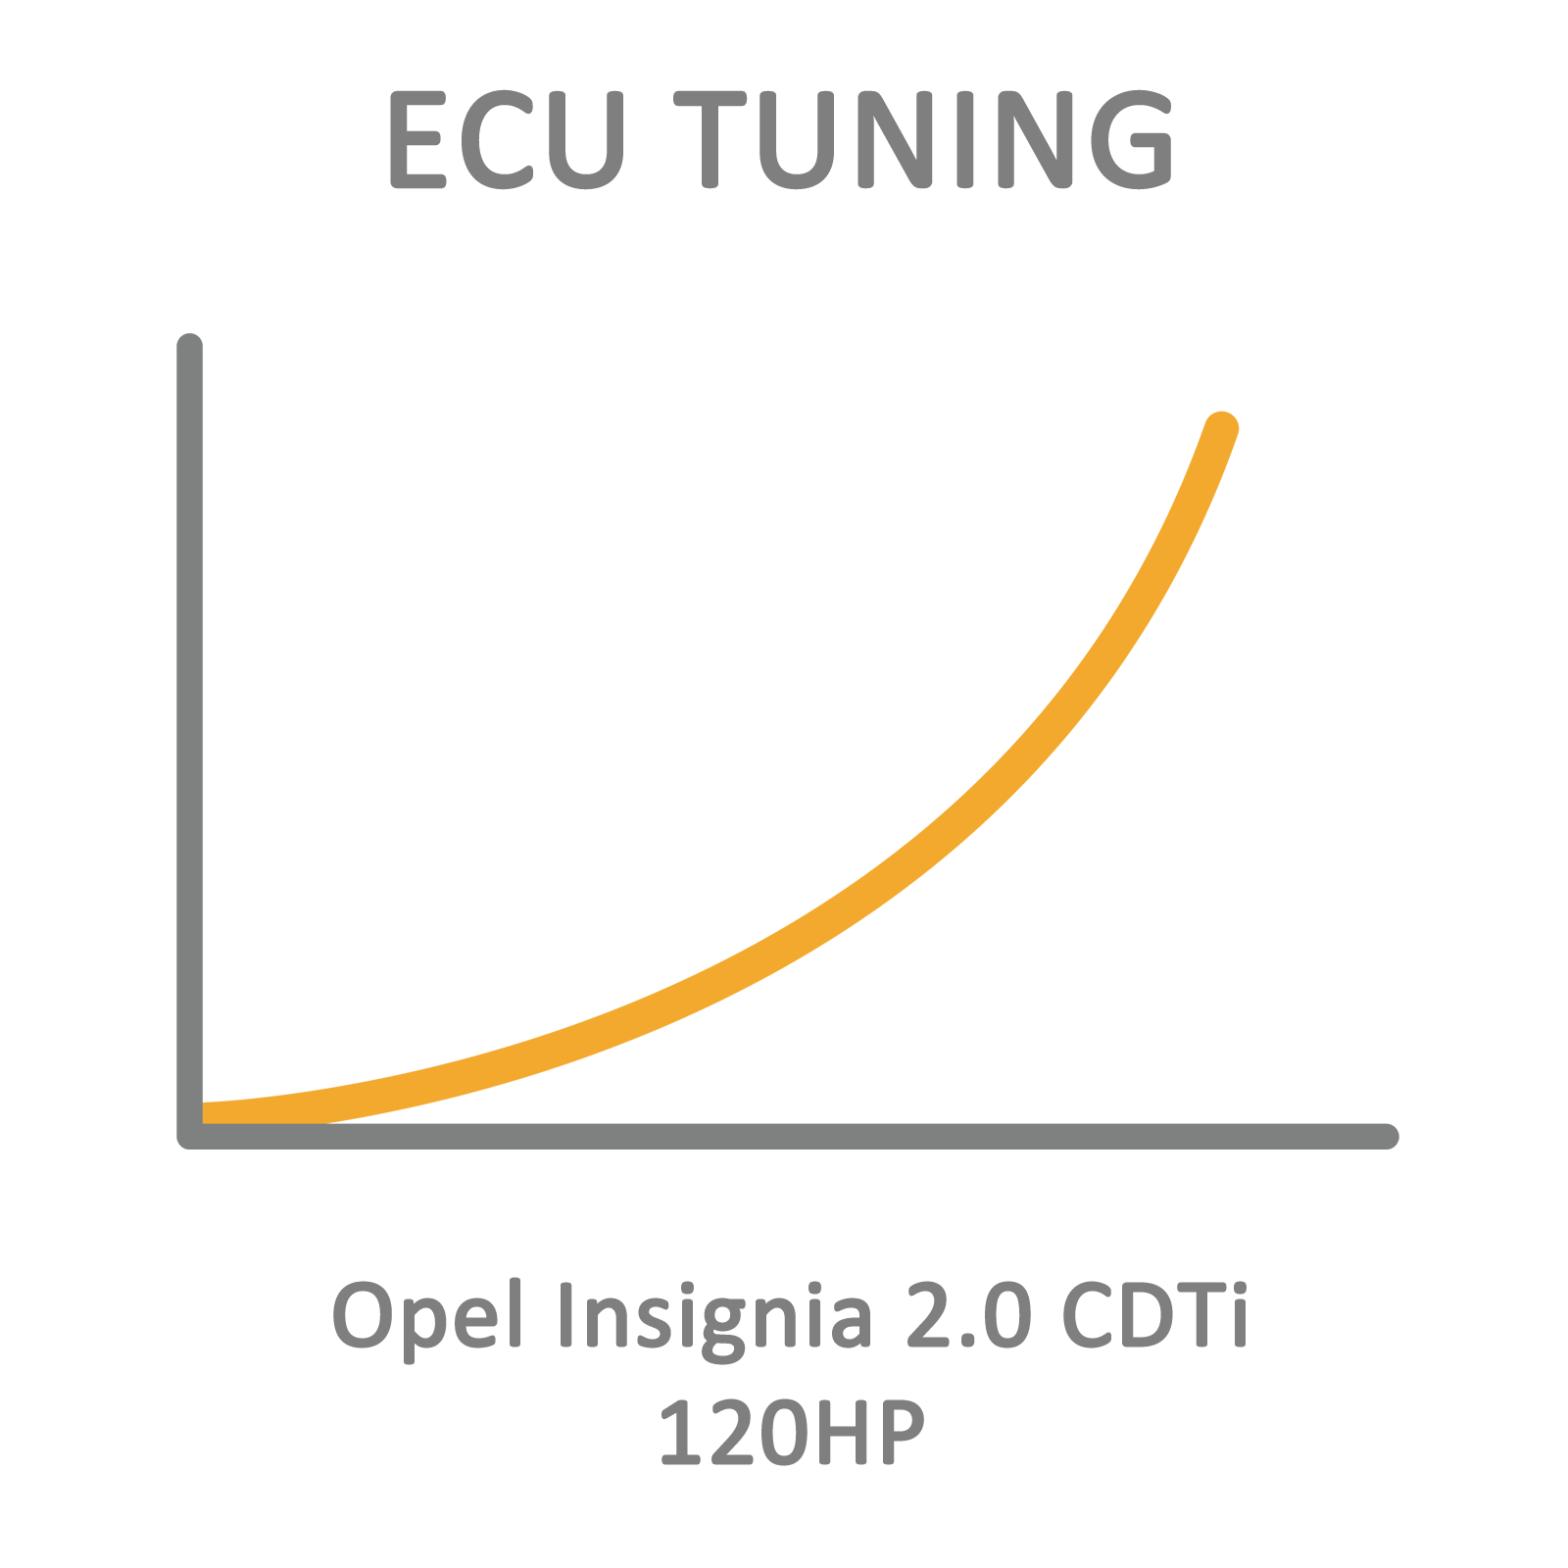 Opel Insignia 2.0 CDTi 120HP ECU Tuning Remapping Programming